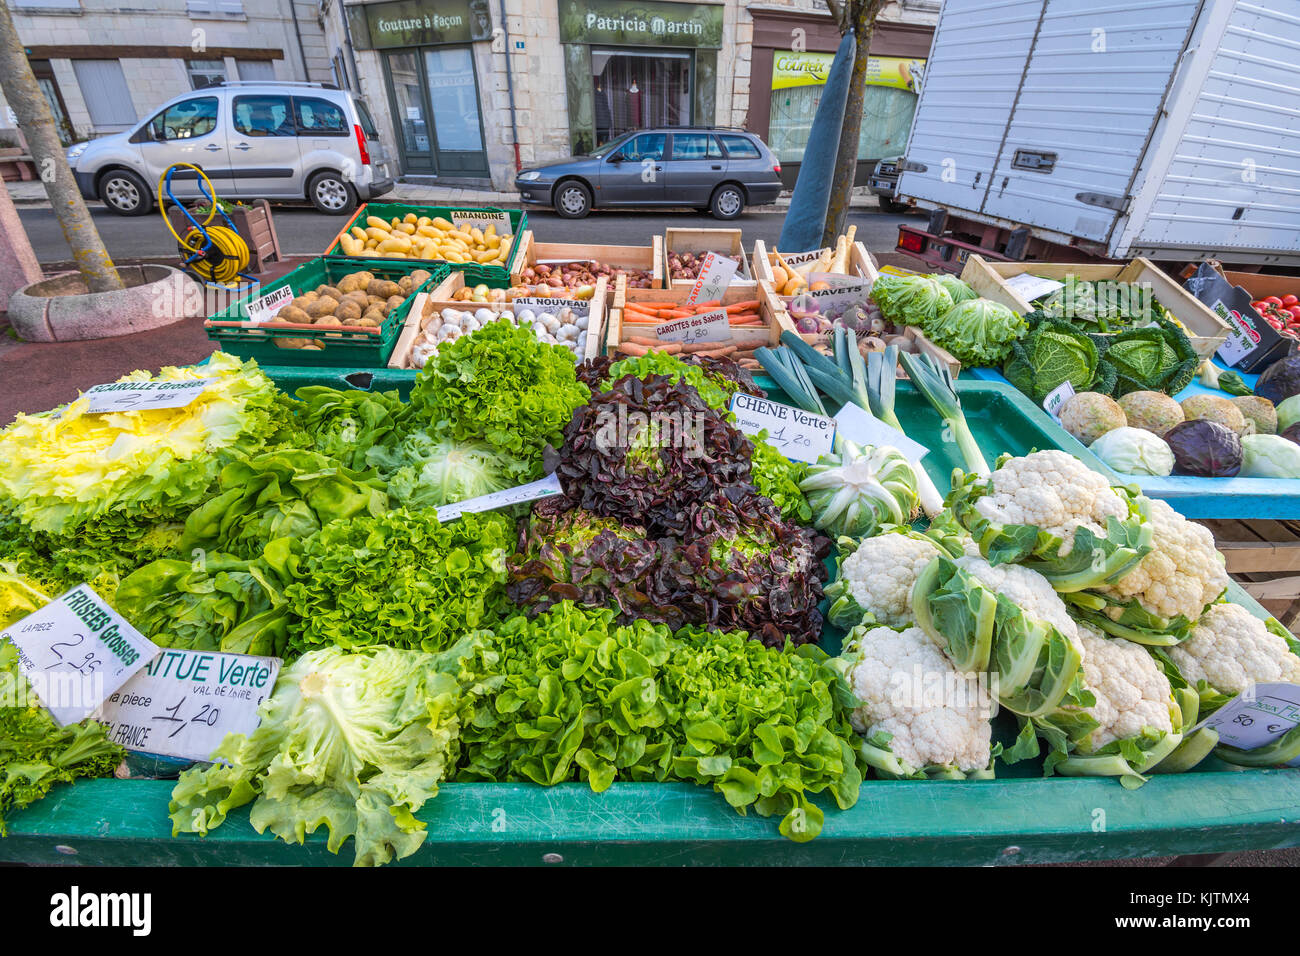 Lettuces foir sale at open-air market - France. - Stock Image